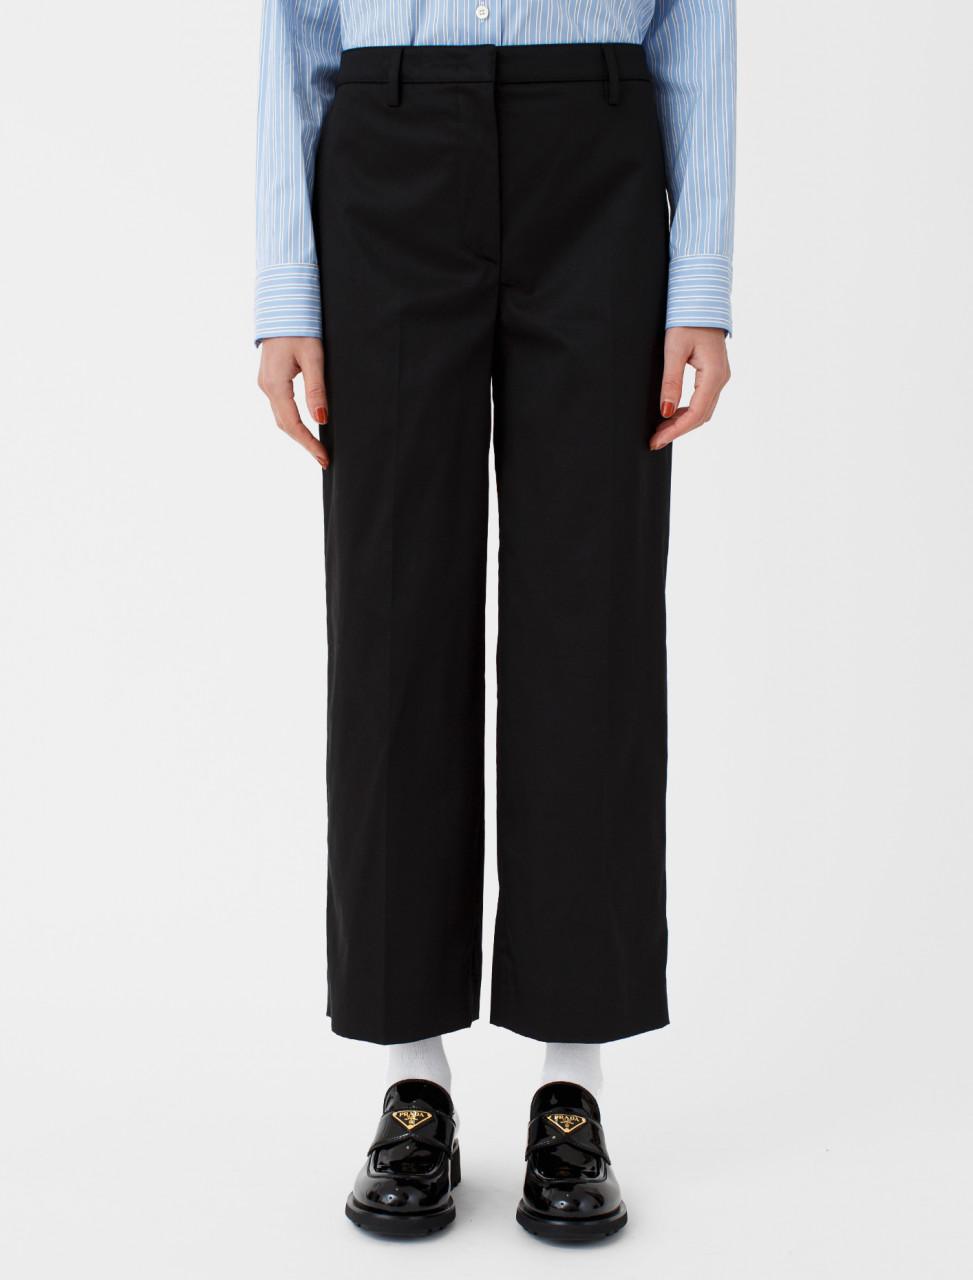 Prada Sateen Trousers